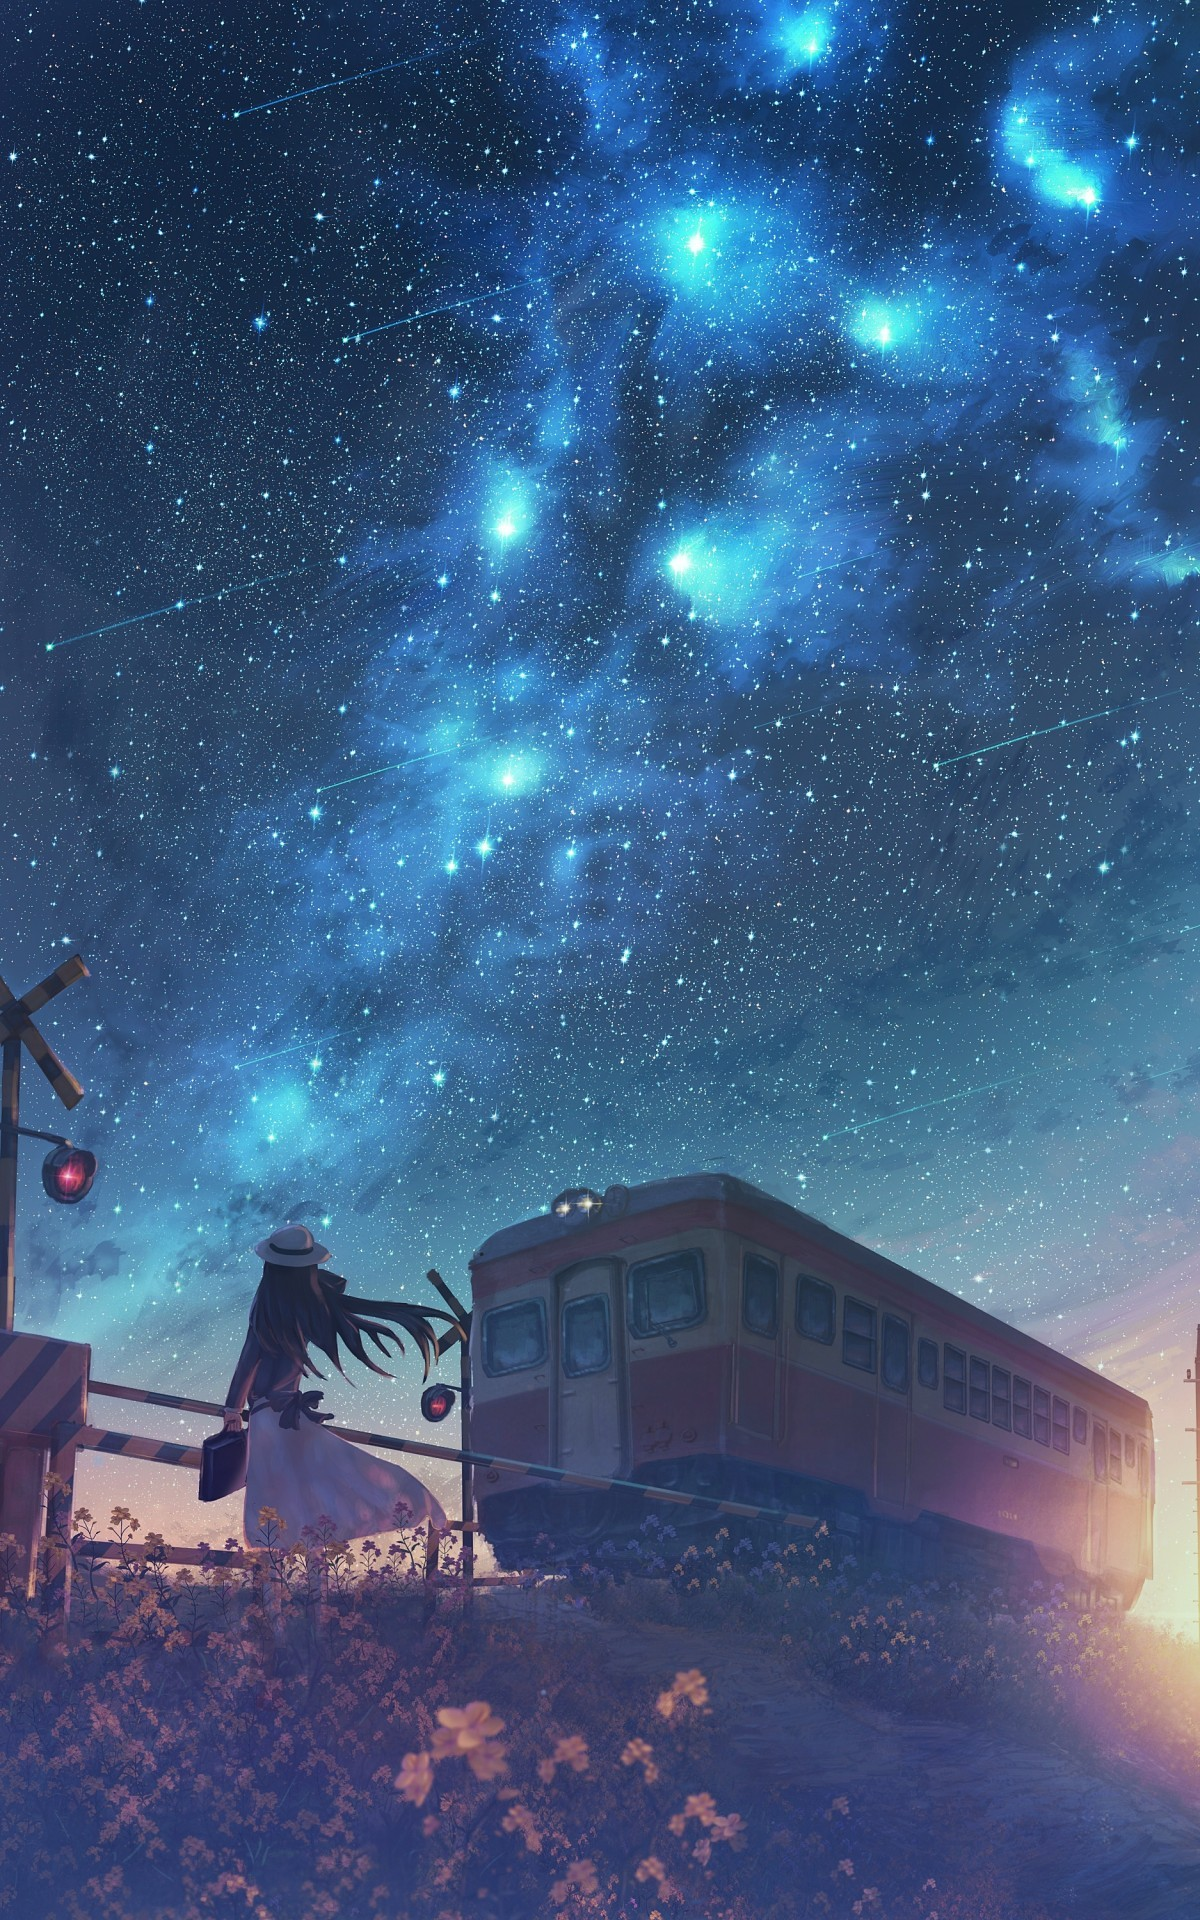 Anime Anime Girls Original Characters Starry Night Railway Crossing Emotion Stars Night 1200x1920